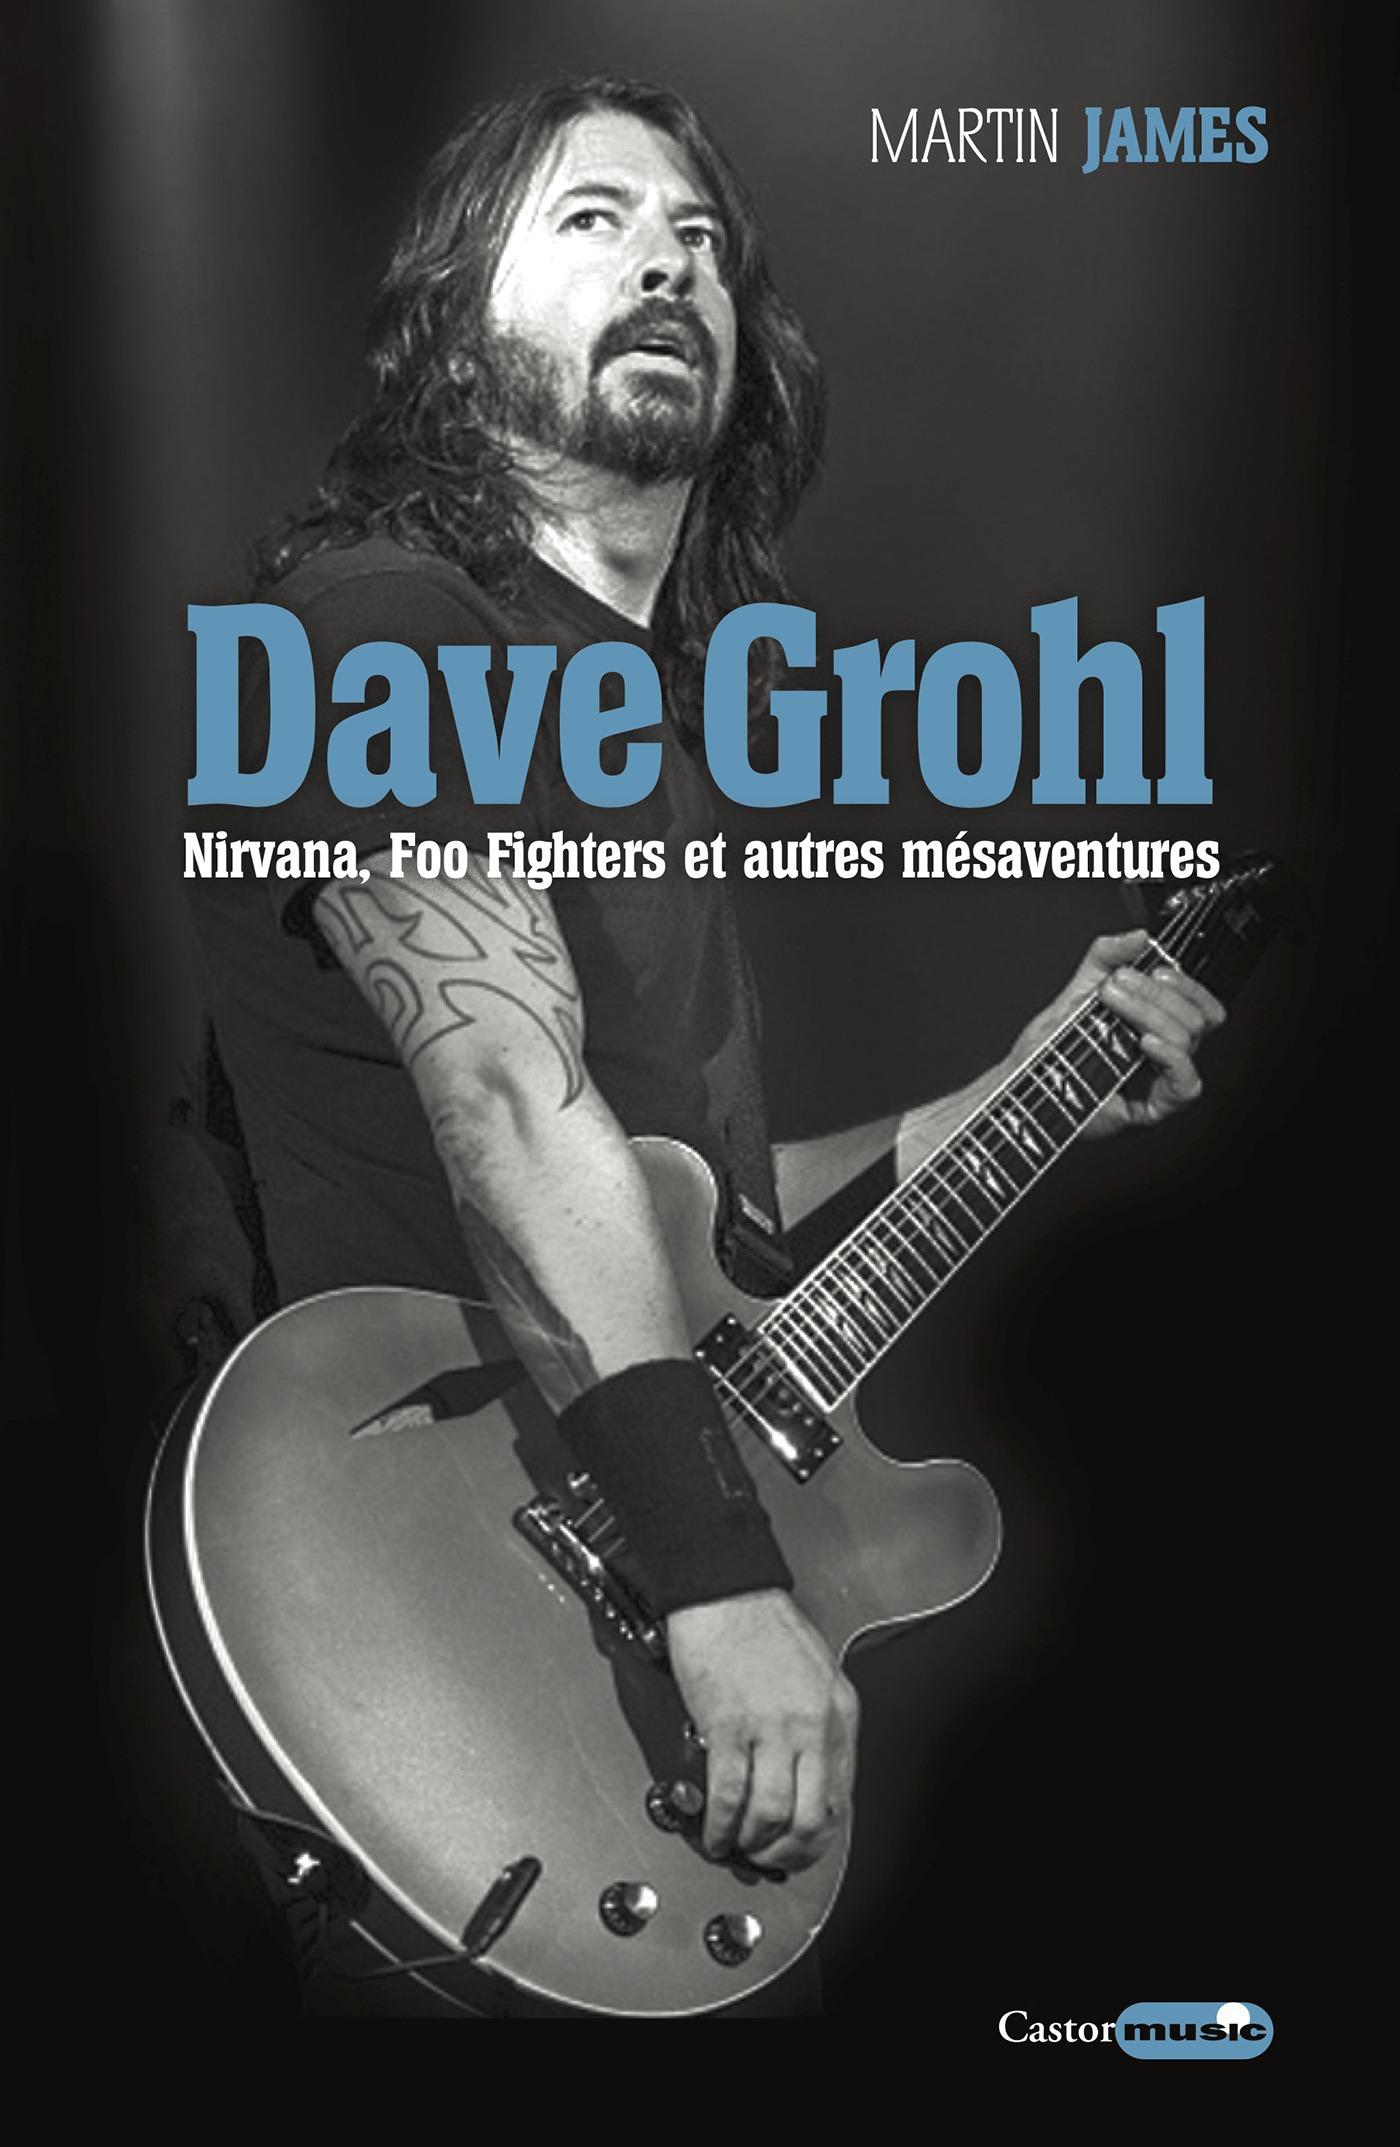 Dave Grohl ; Nirvana, Foo Fighters et autres mésaventures